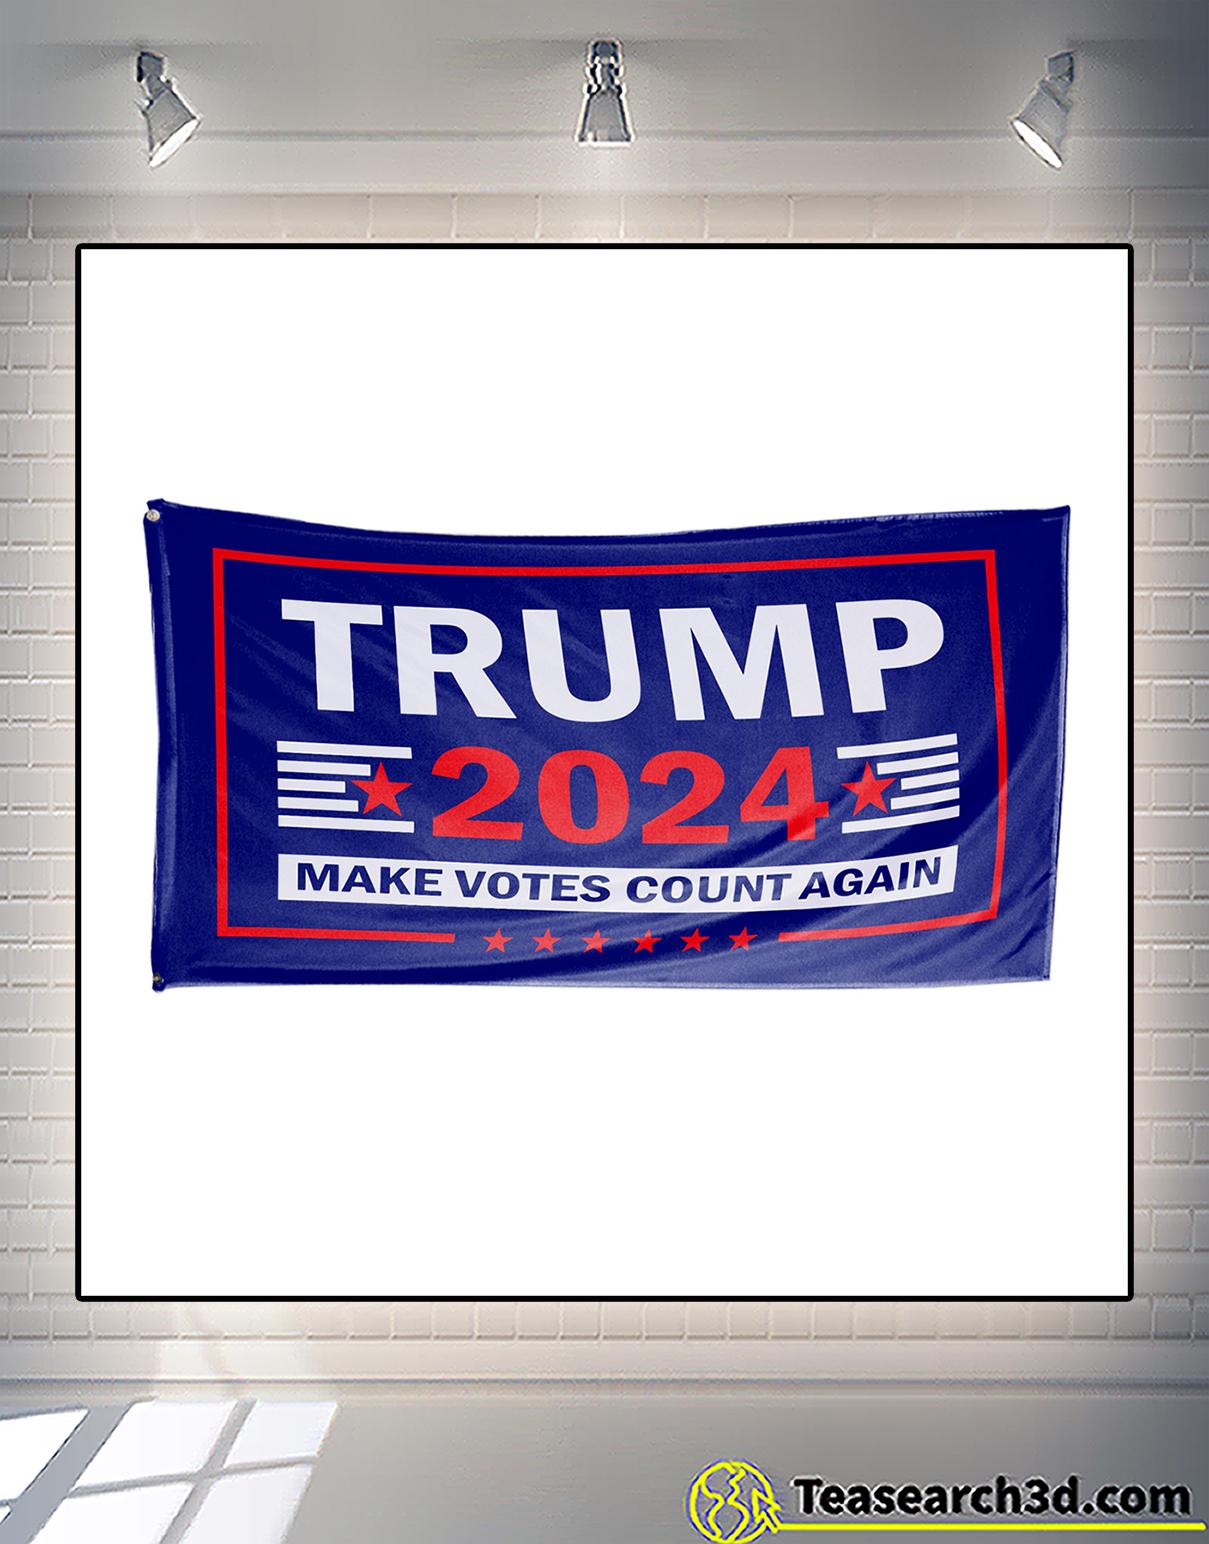 Trump 2024 make votes count again flag 1